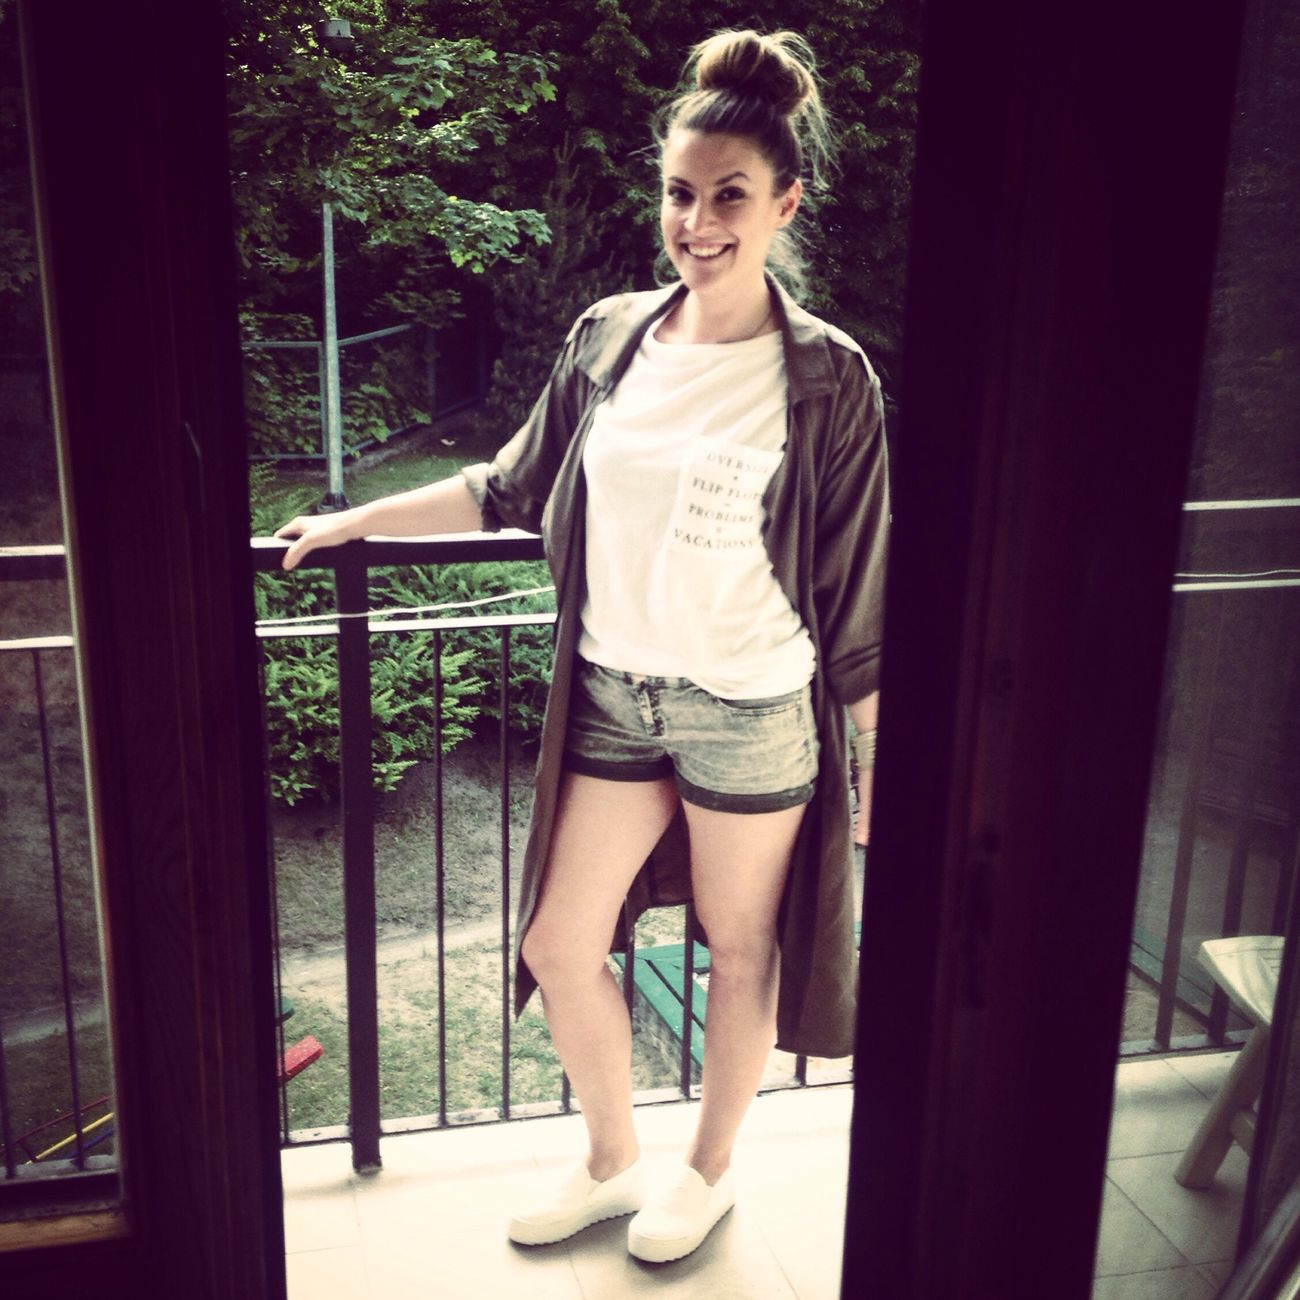 That's Me Now Polishgirl Streetwear Colours Of Nature Khaki Trenchcoat Slipon Happy Good Mood :)